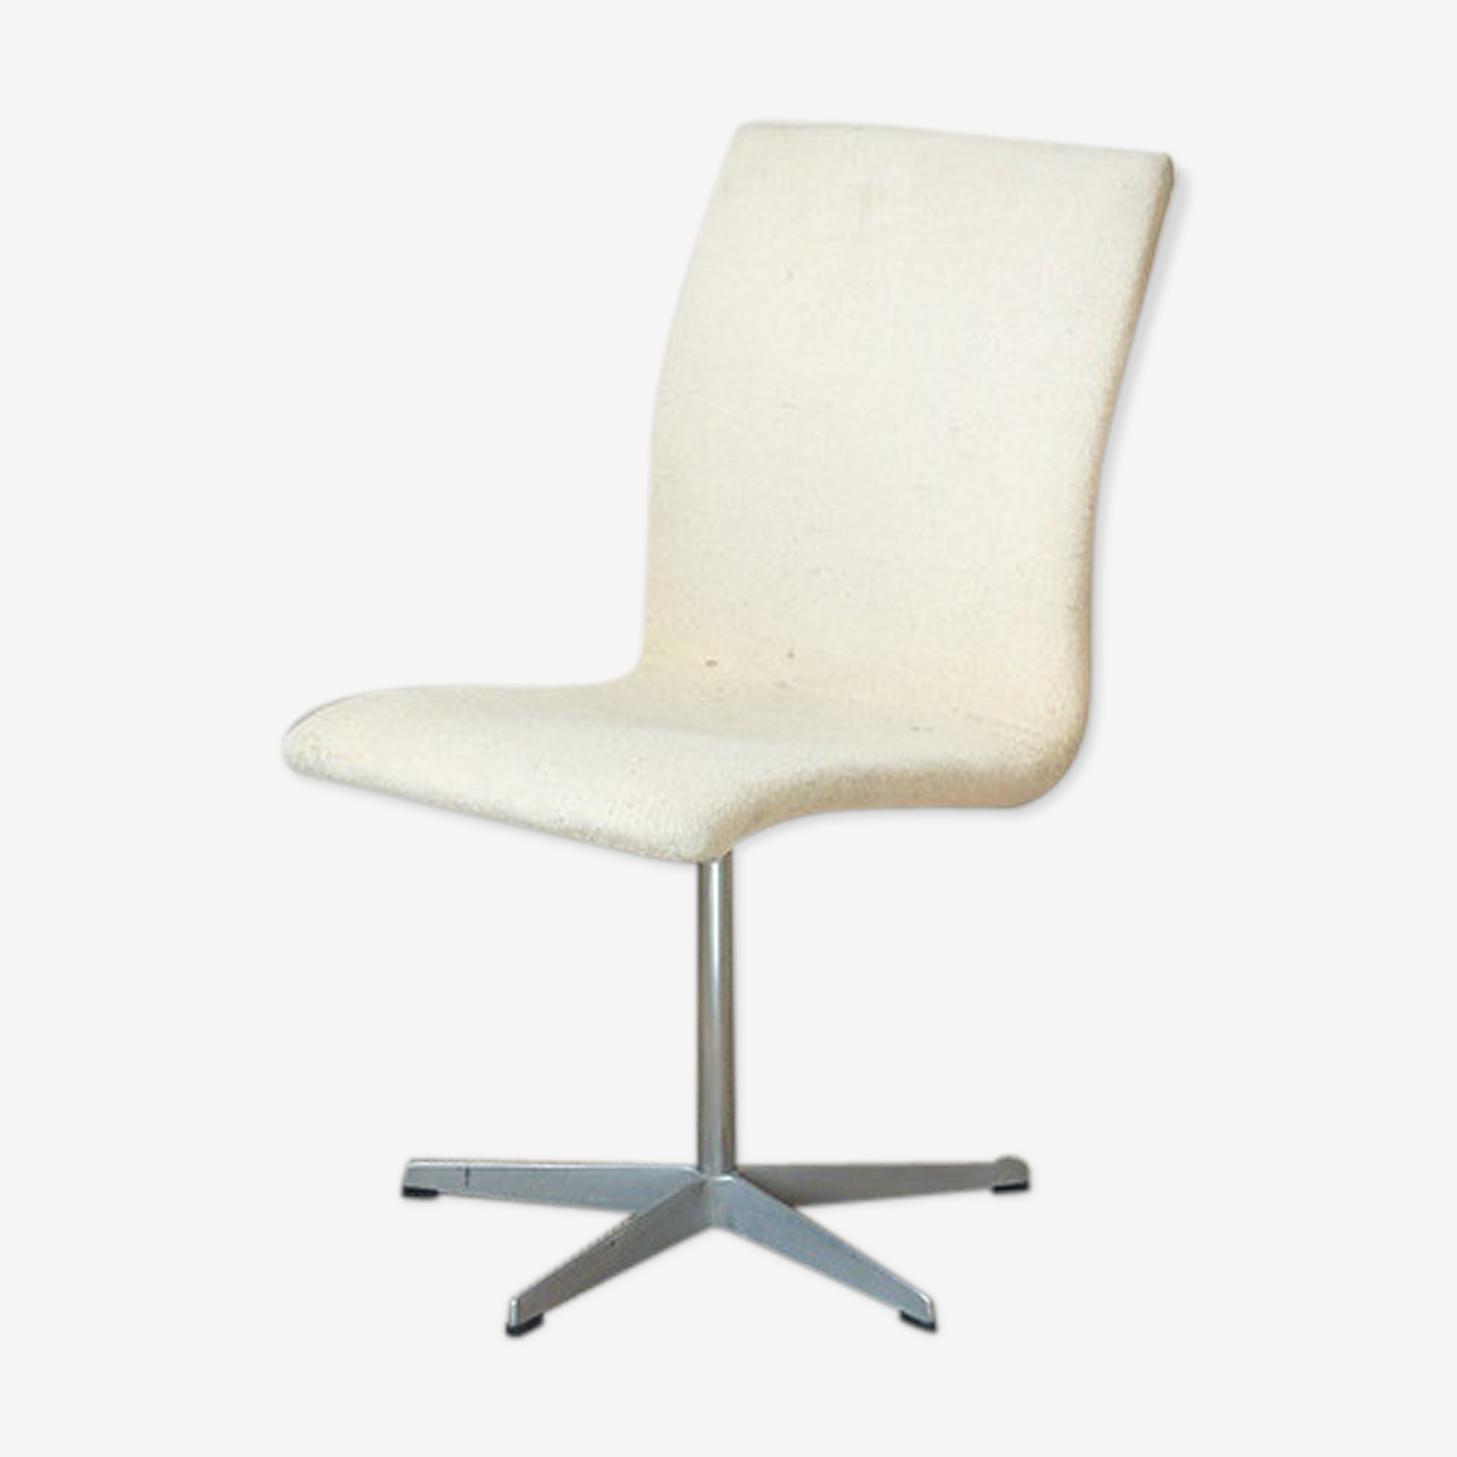 Chaise scandinave Oxford design A. Jacobsen édition vintage Fritz Hansen